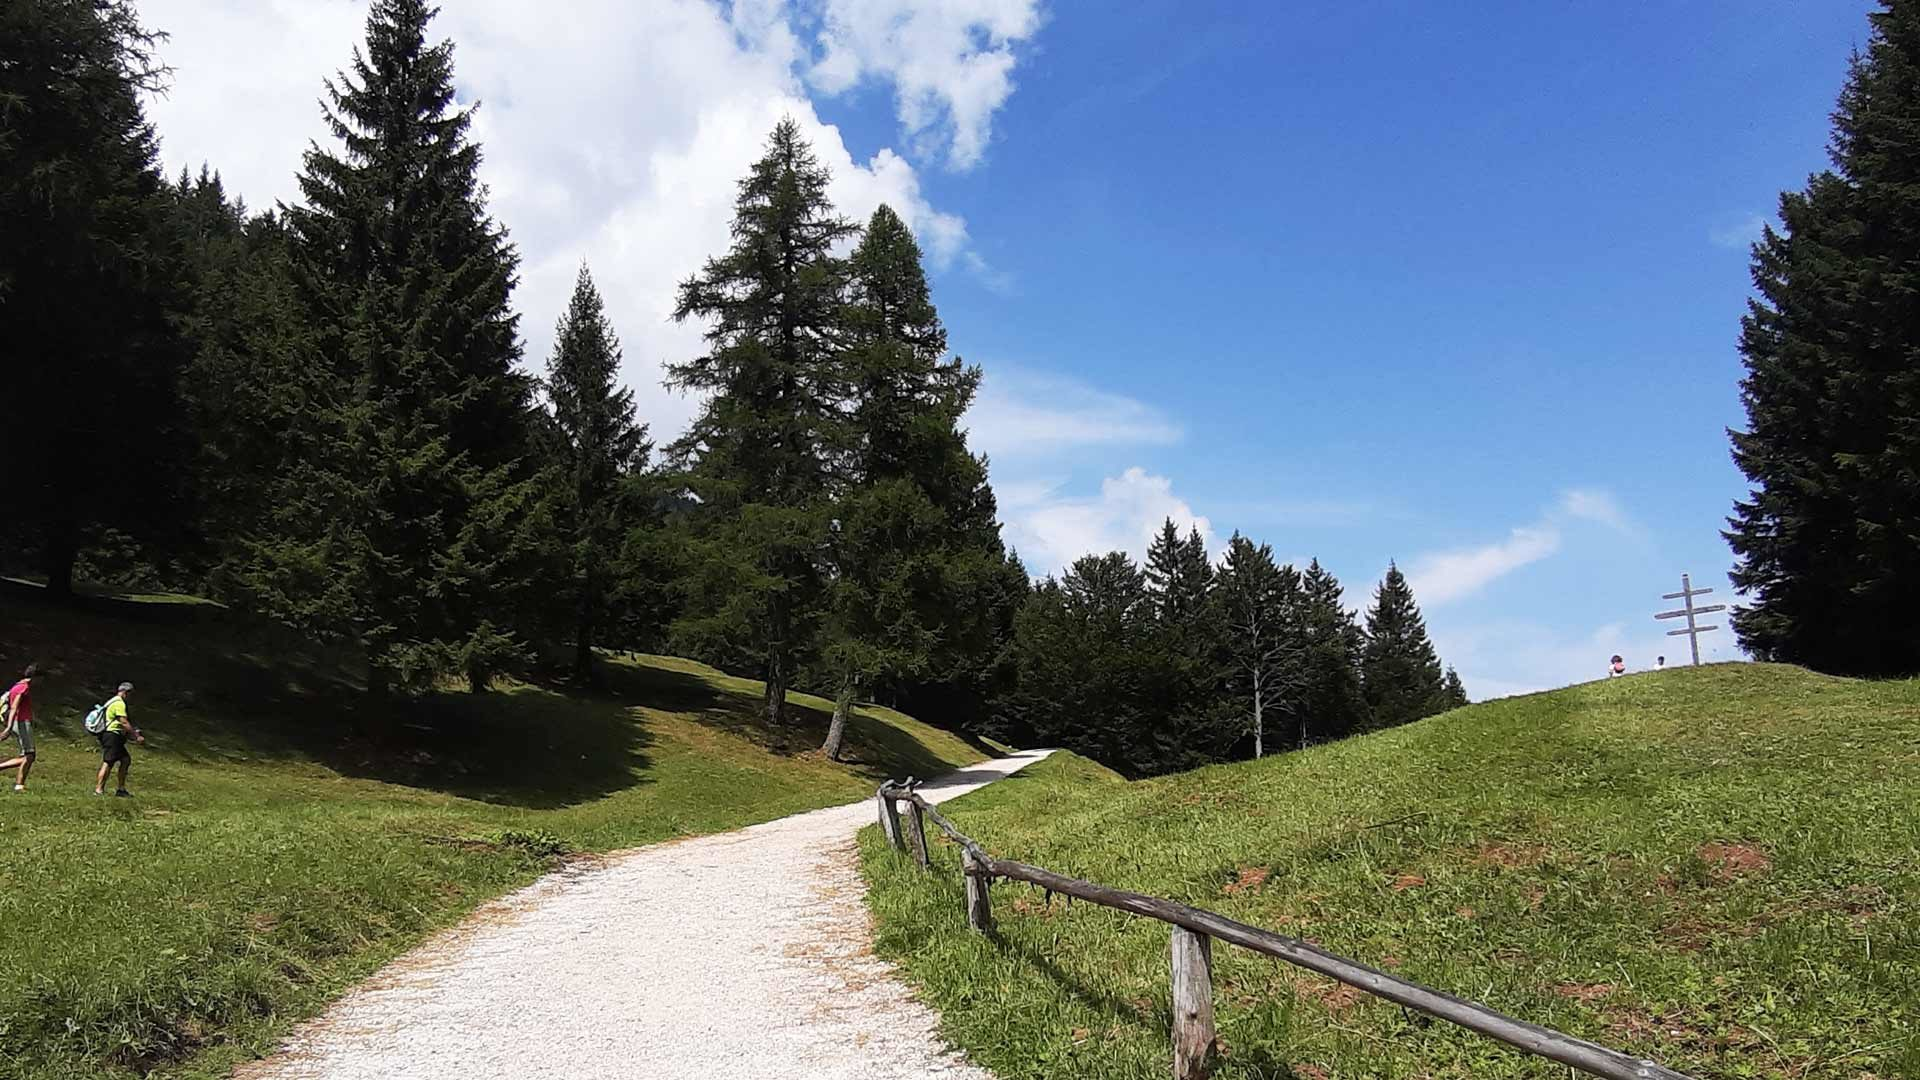 Wanderung zur Laugenalm